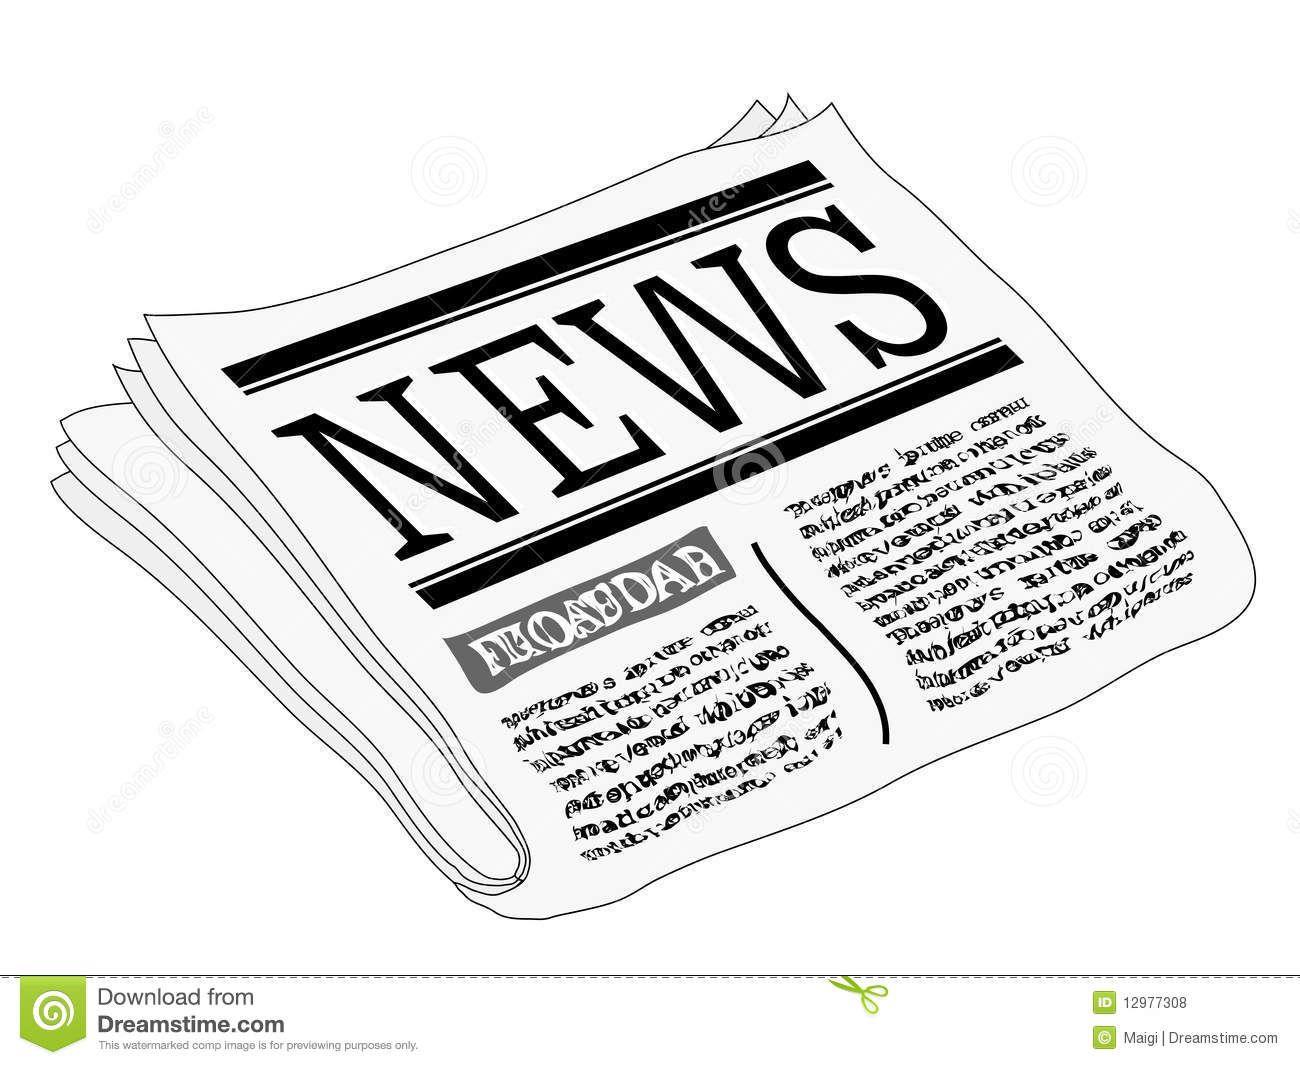 Semaine de la presse  récap' des articles   Clip art, Newspaper ...